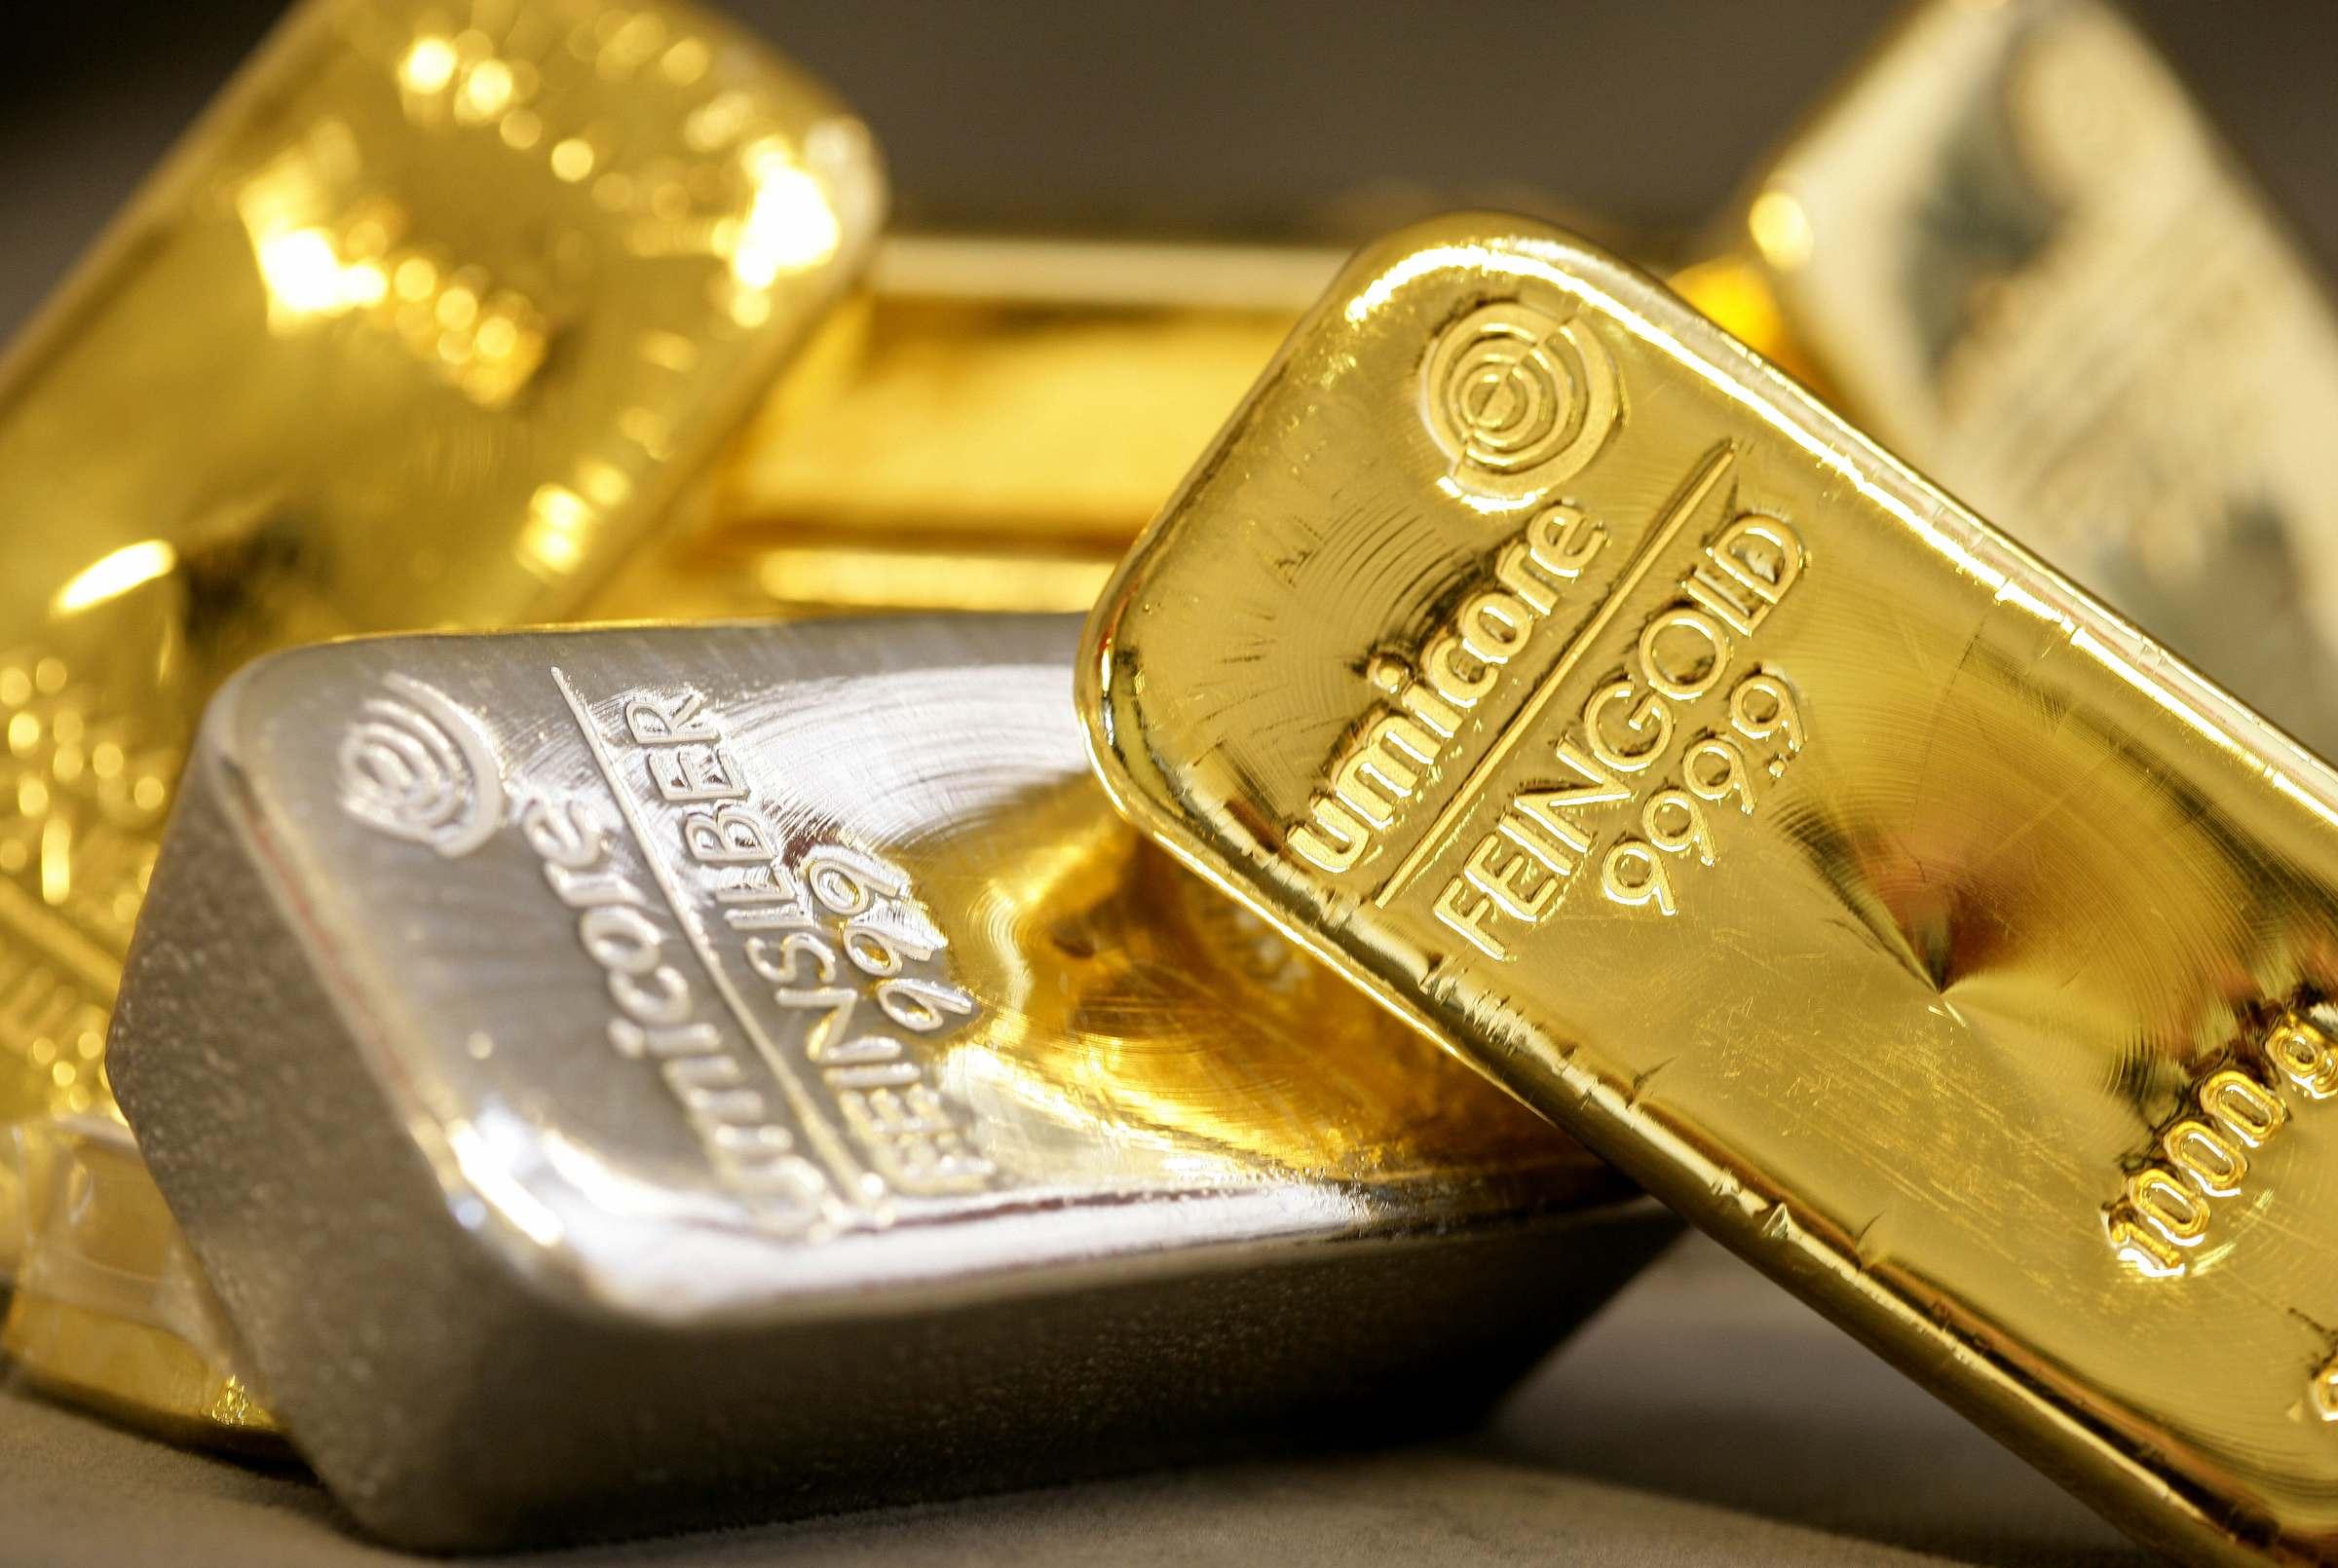 Soaring Gold, Silver, Platinum ETFs Power Up